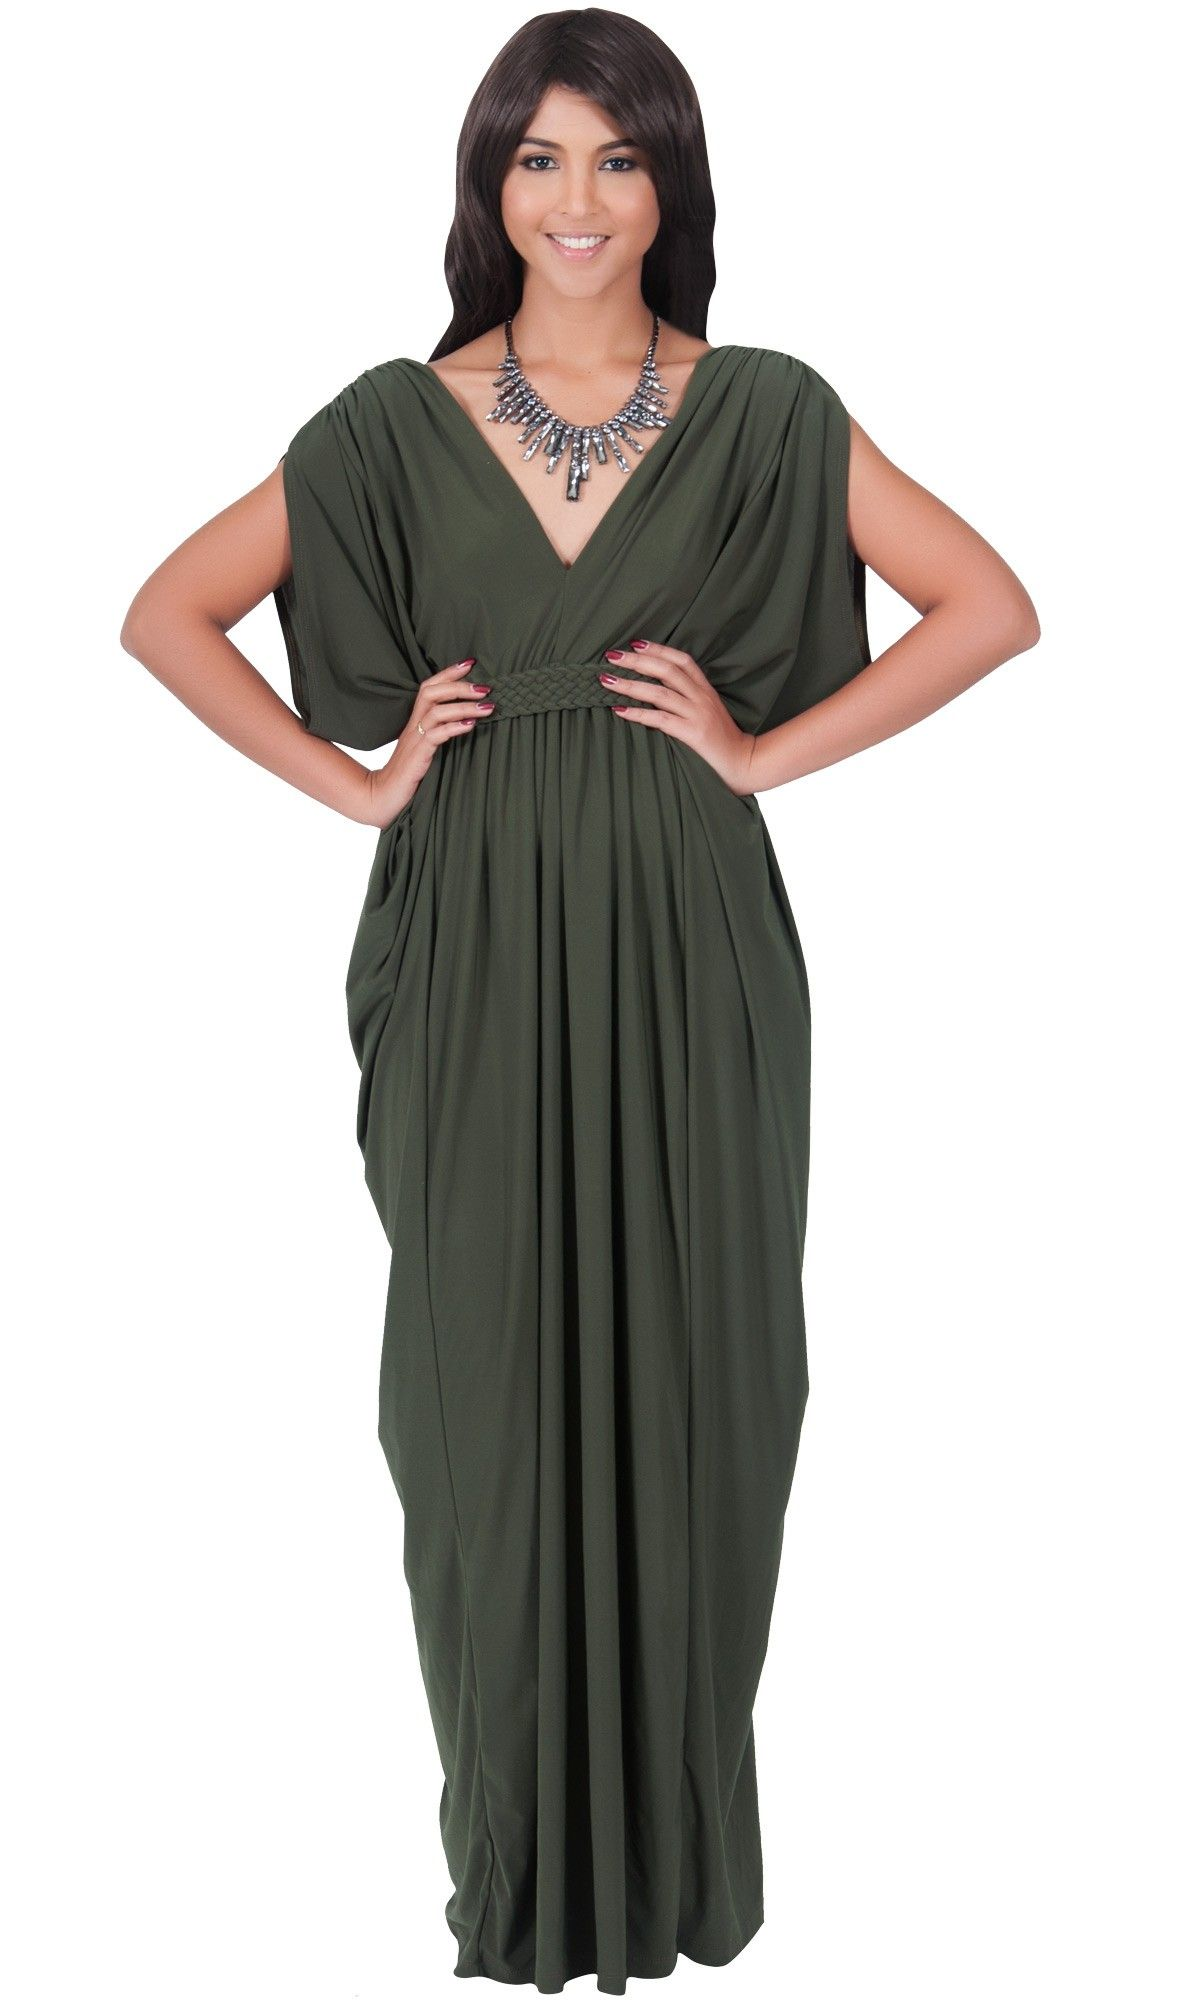 5fc6e49db0a SHELBY - Sleeveless Long Comfortable Maxi Dress Vacation Evening Sun ...